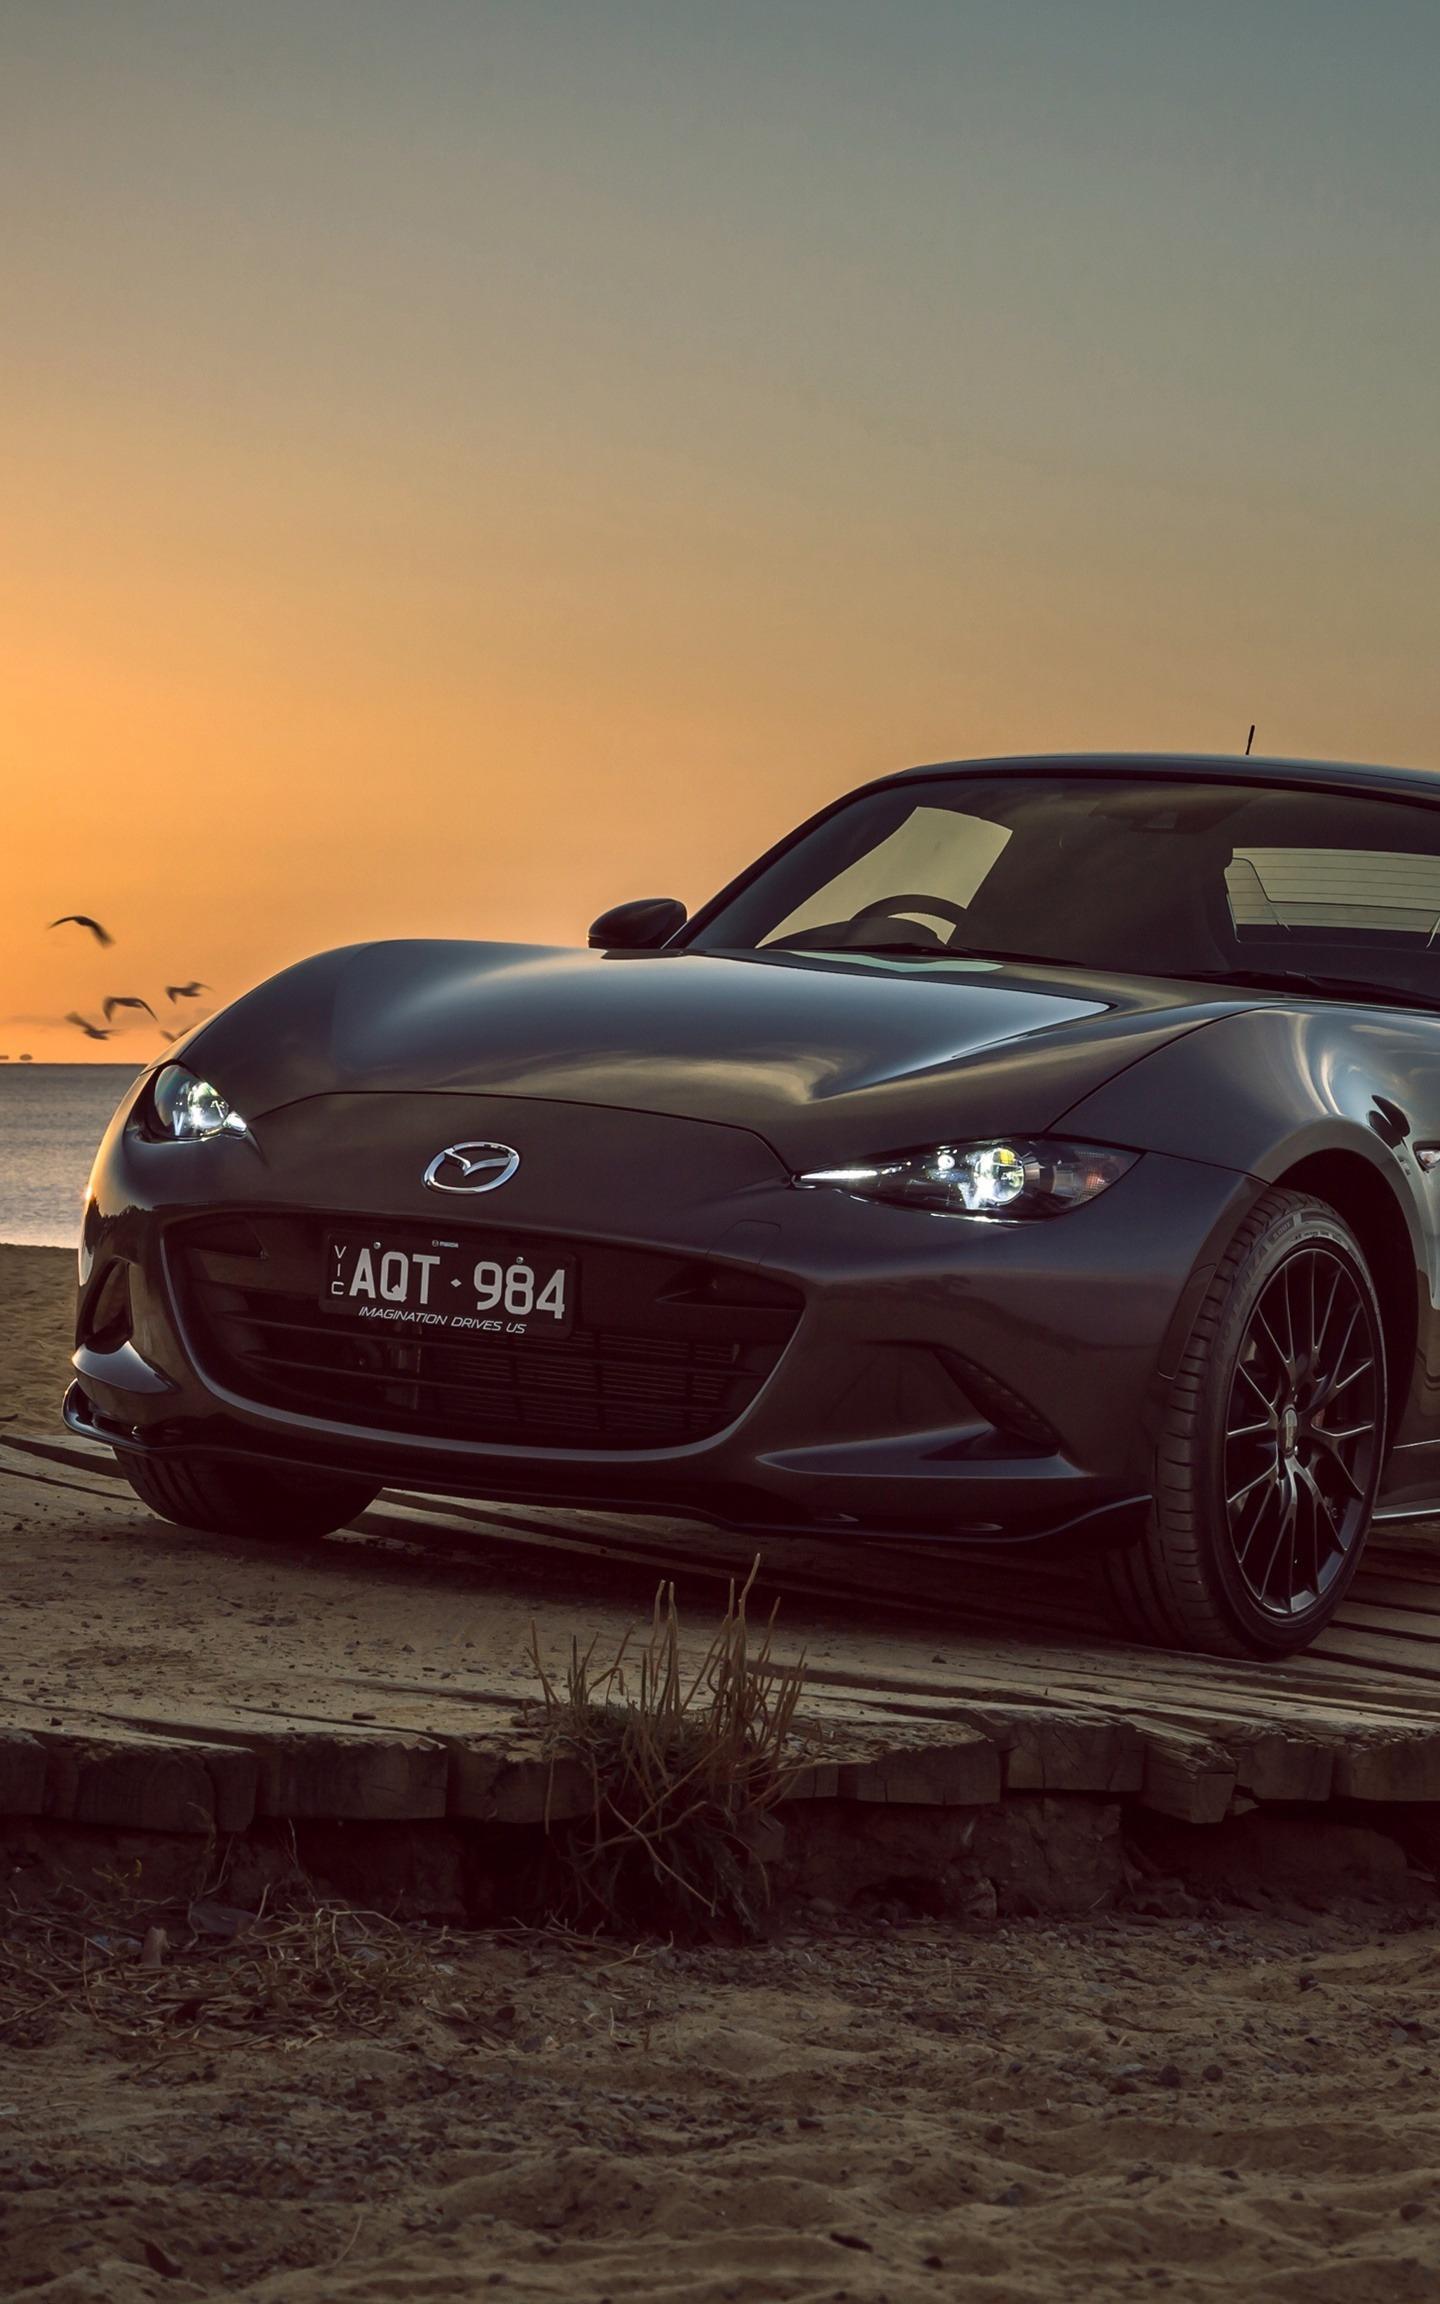 Bon Download 1440x2960 Wallpaper Mazda Mx 5, Sports Car, Black, Sunset,  Samsung